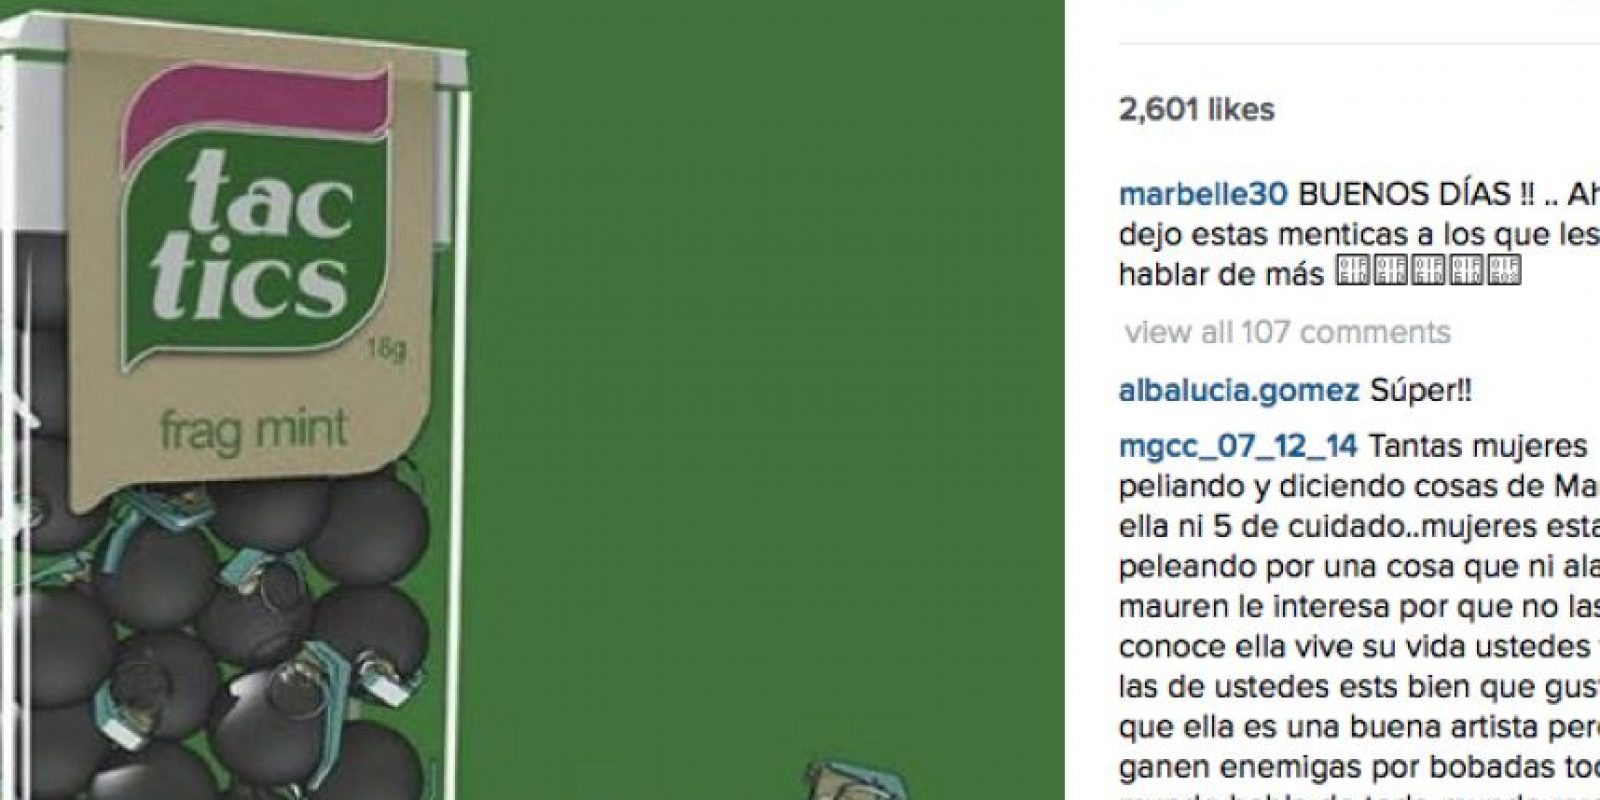 Foto:Instagram marbelle30